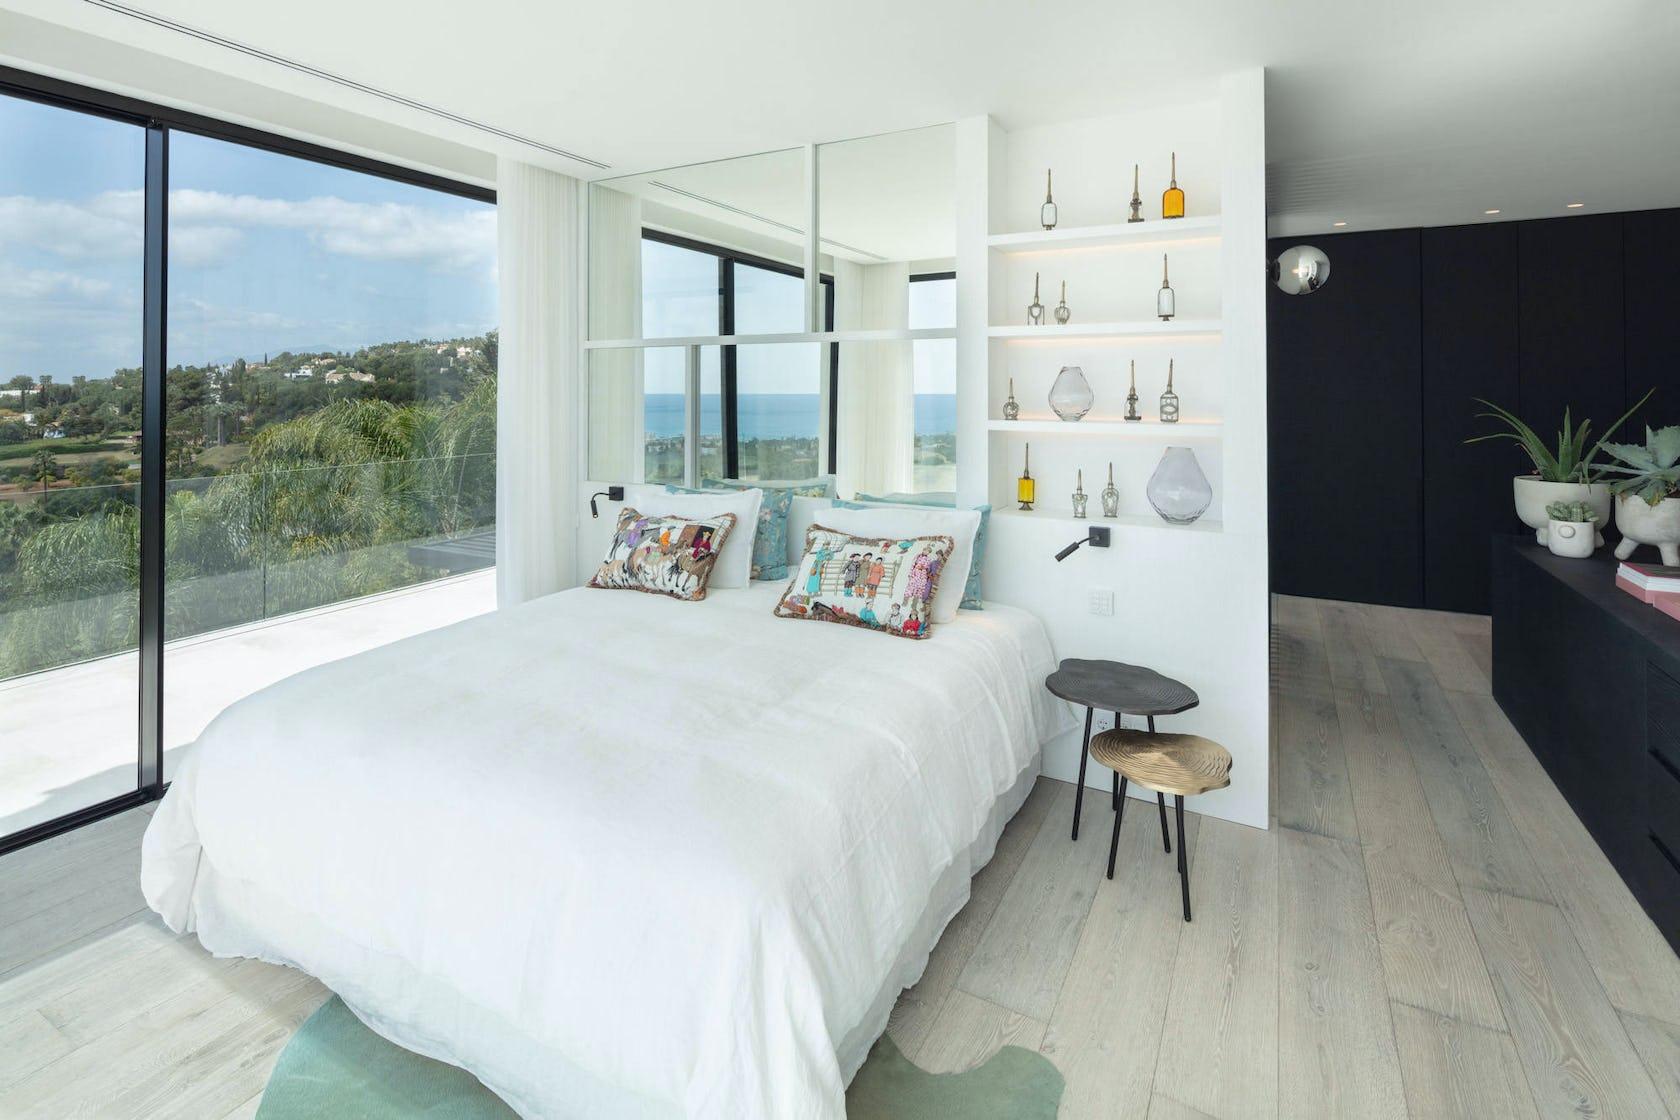 bed furniture bedroom room indoors interior design